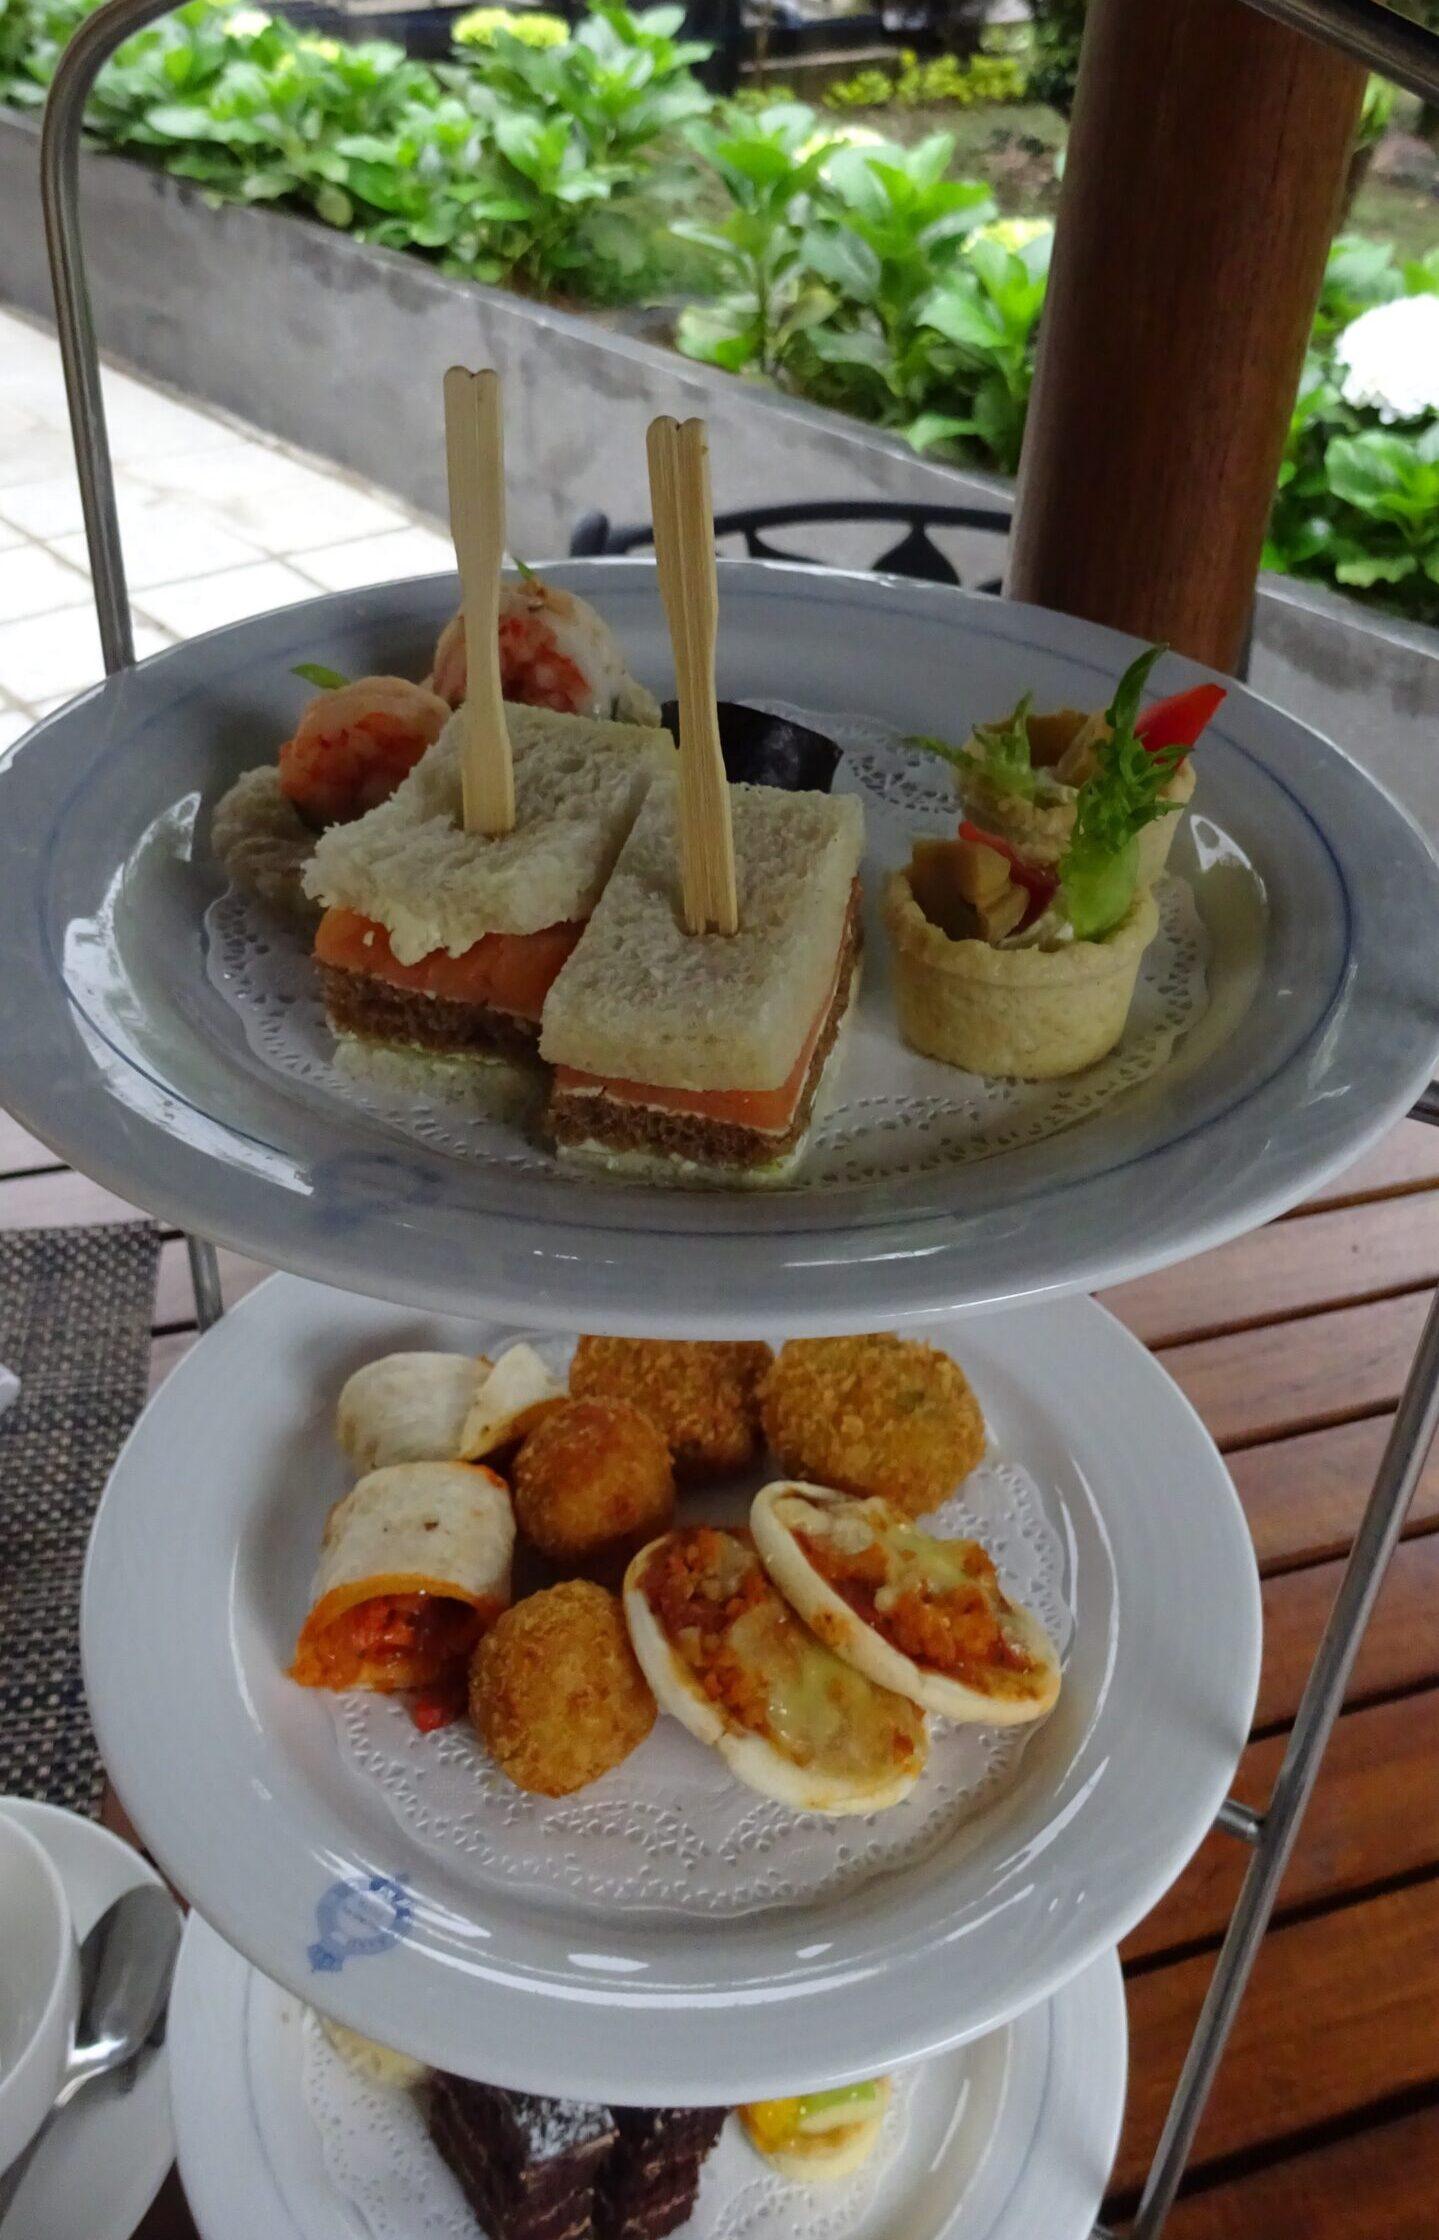 High tea 3 tiered stand with sandwiches and cake at The Grand Hotel, Nuwara Eliya, Sri Lanka